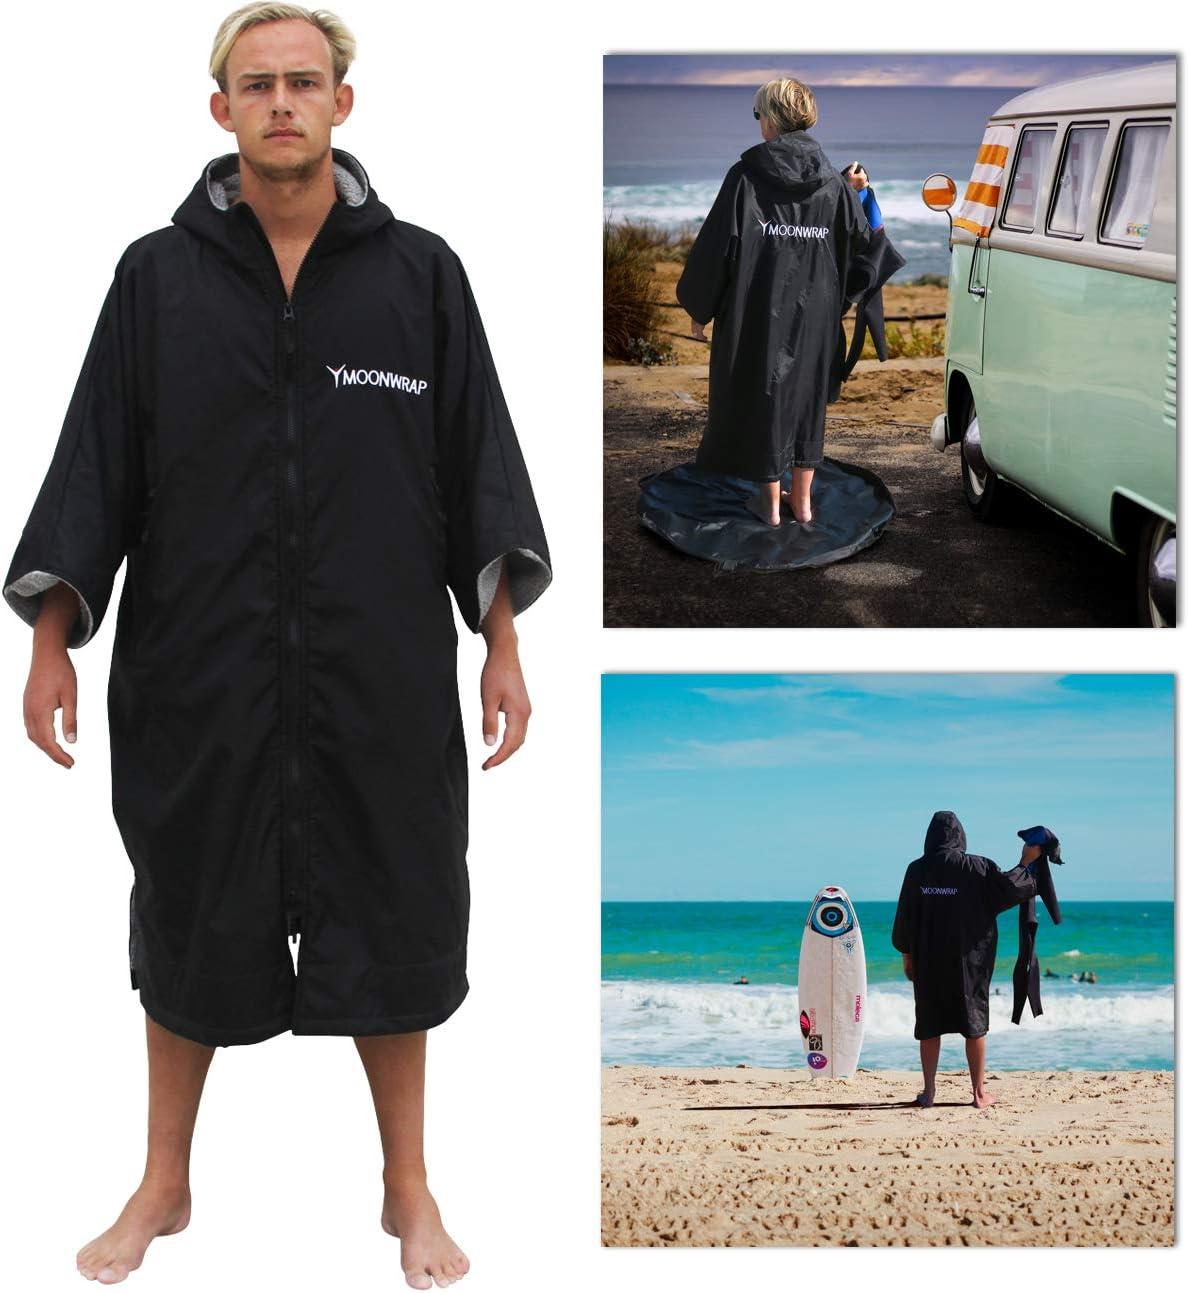 Frostfire Moonwrap - Adult Waterproof Changing Robe